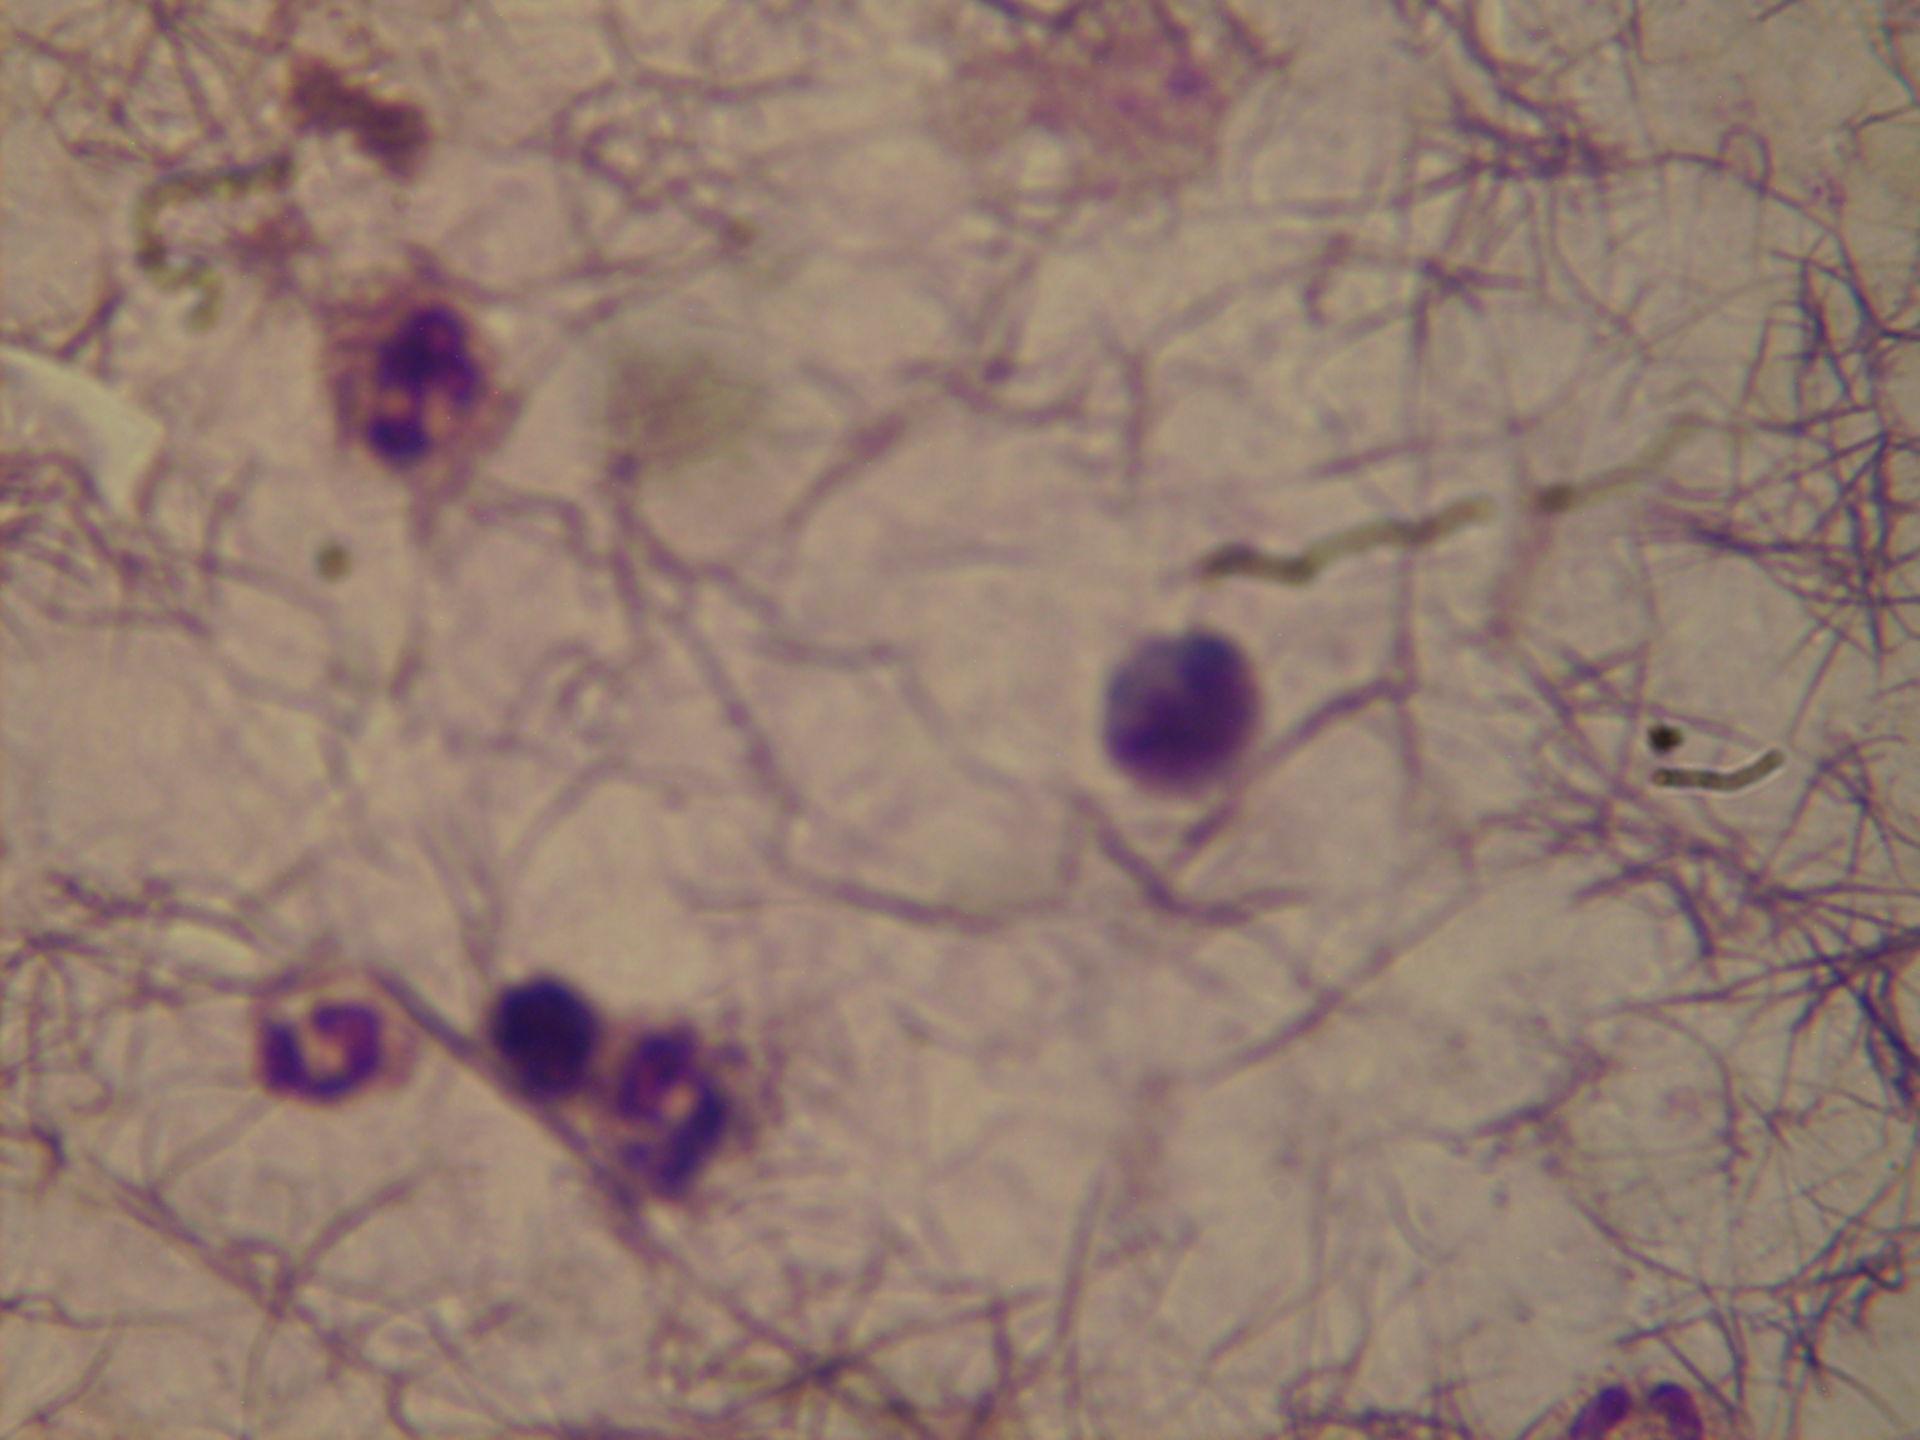 plasmodium ovale schüffner typfungd